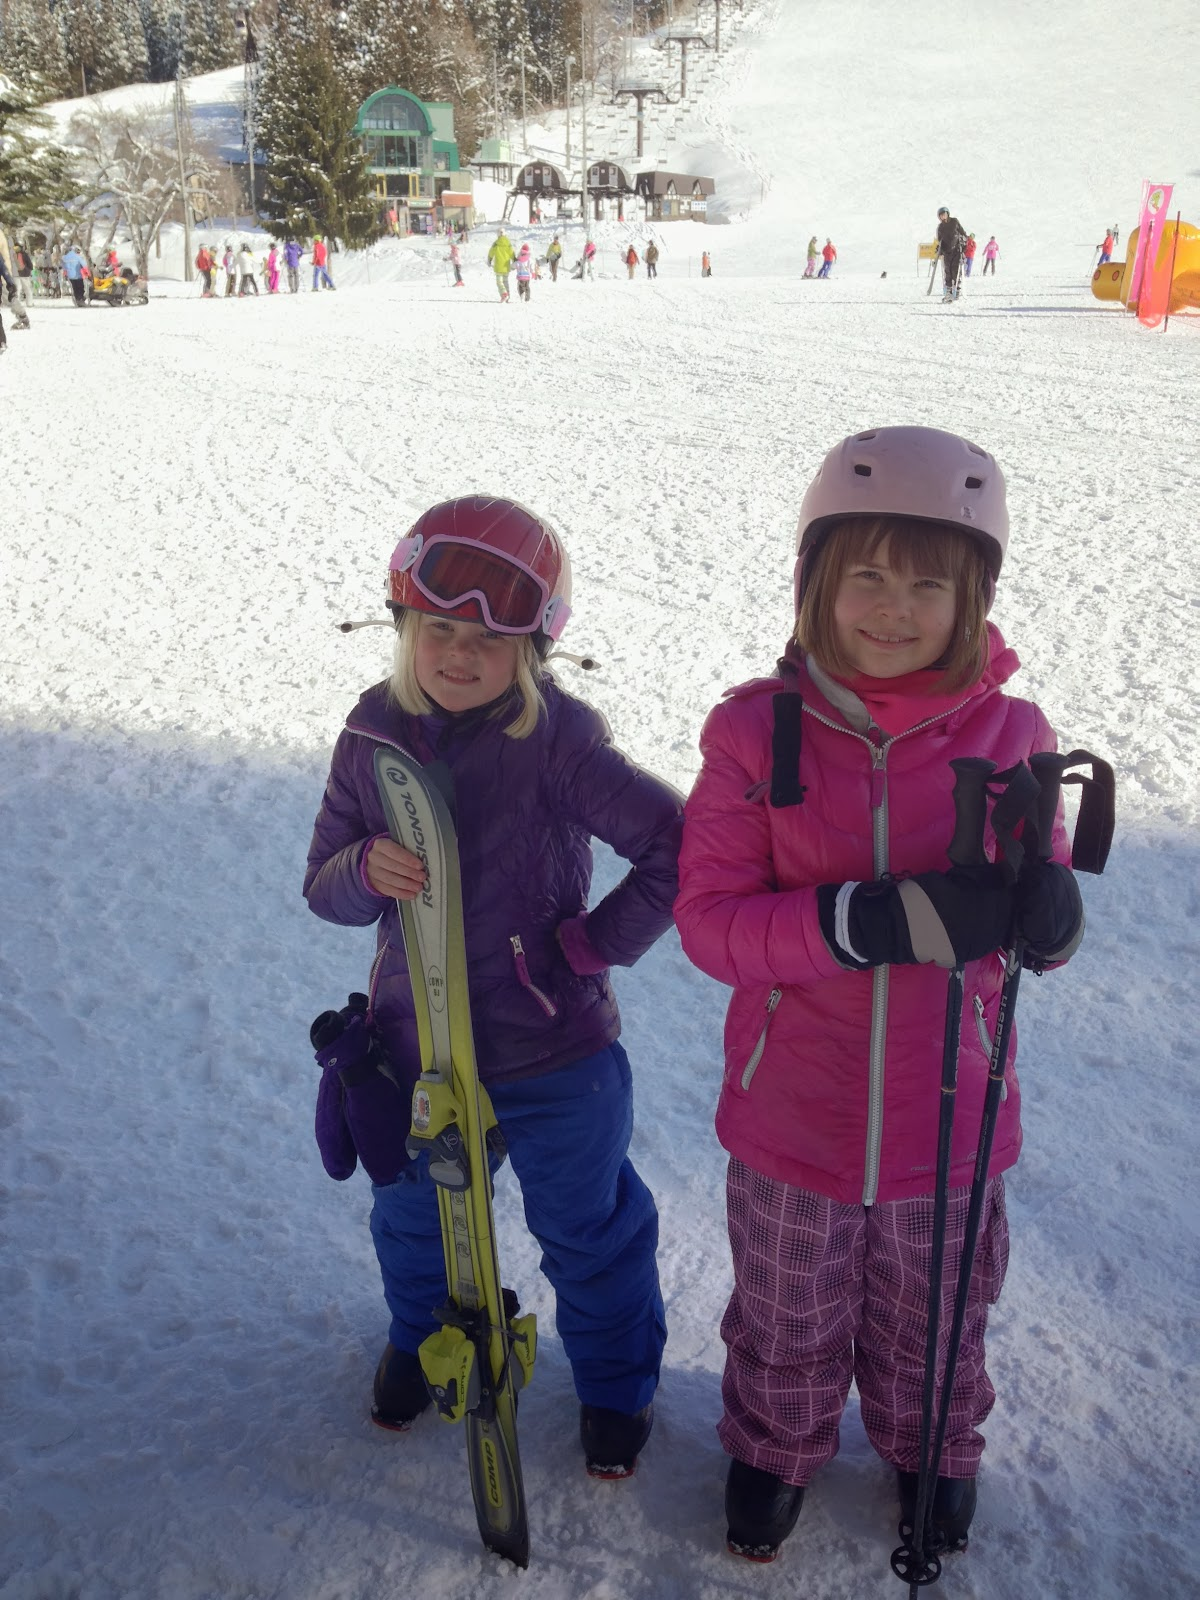 "<a href=""http://vionm.com/"">Thailand</a> <a href=""http://vionm.com/things-to-do-in-bangkok-thailand/thailandhoneymoon-explore-the-beauty-of-koh-samui/"">Beach</a>: Nozawa Onsen- Skiing The Japanese Alps"